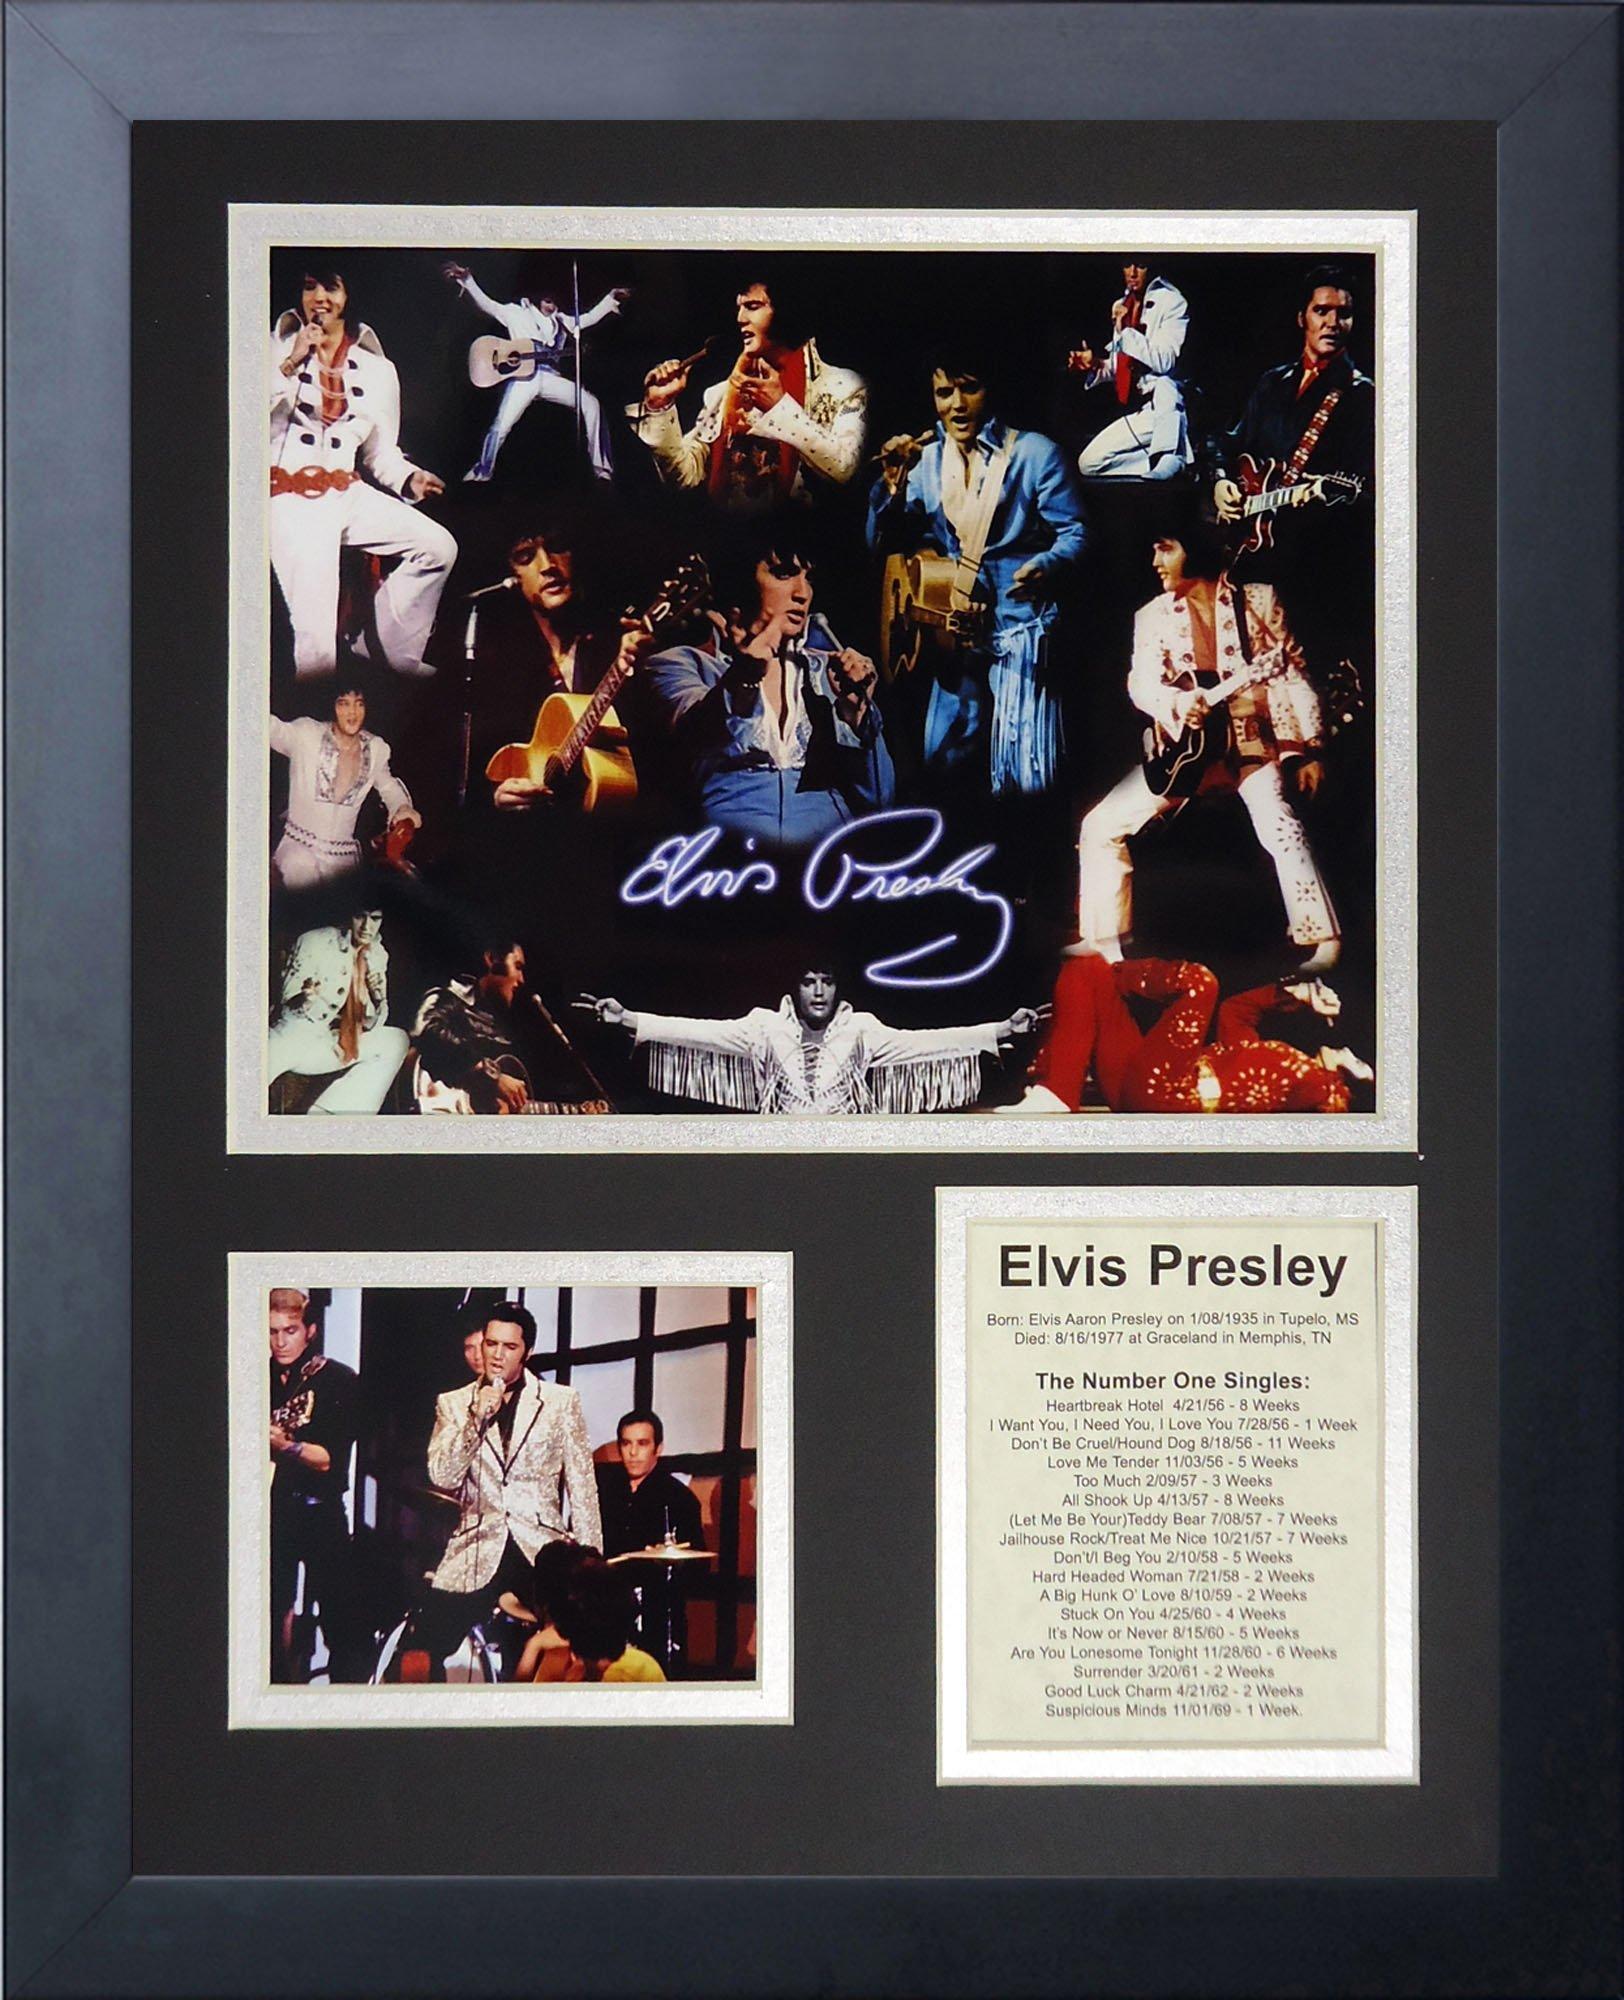 Legends Never Die Elvis Presley Framed Photo Collage, 11x14-Inch by Legends Never Die